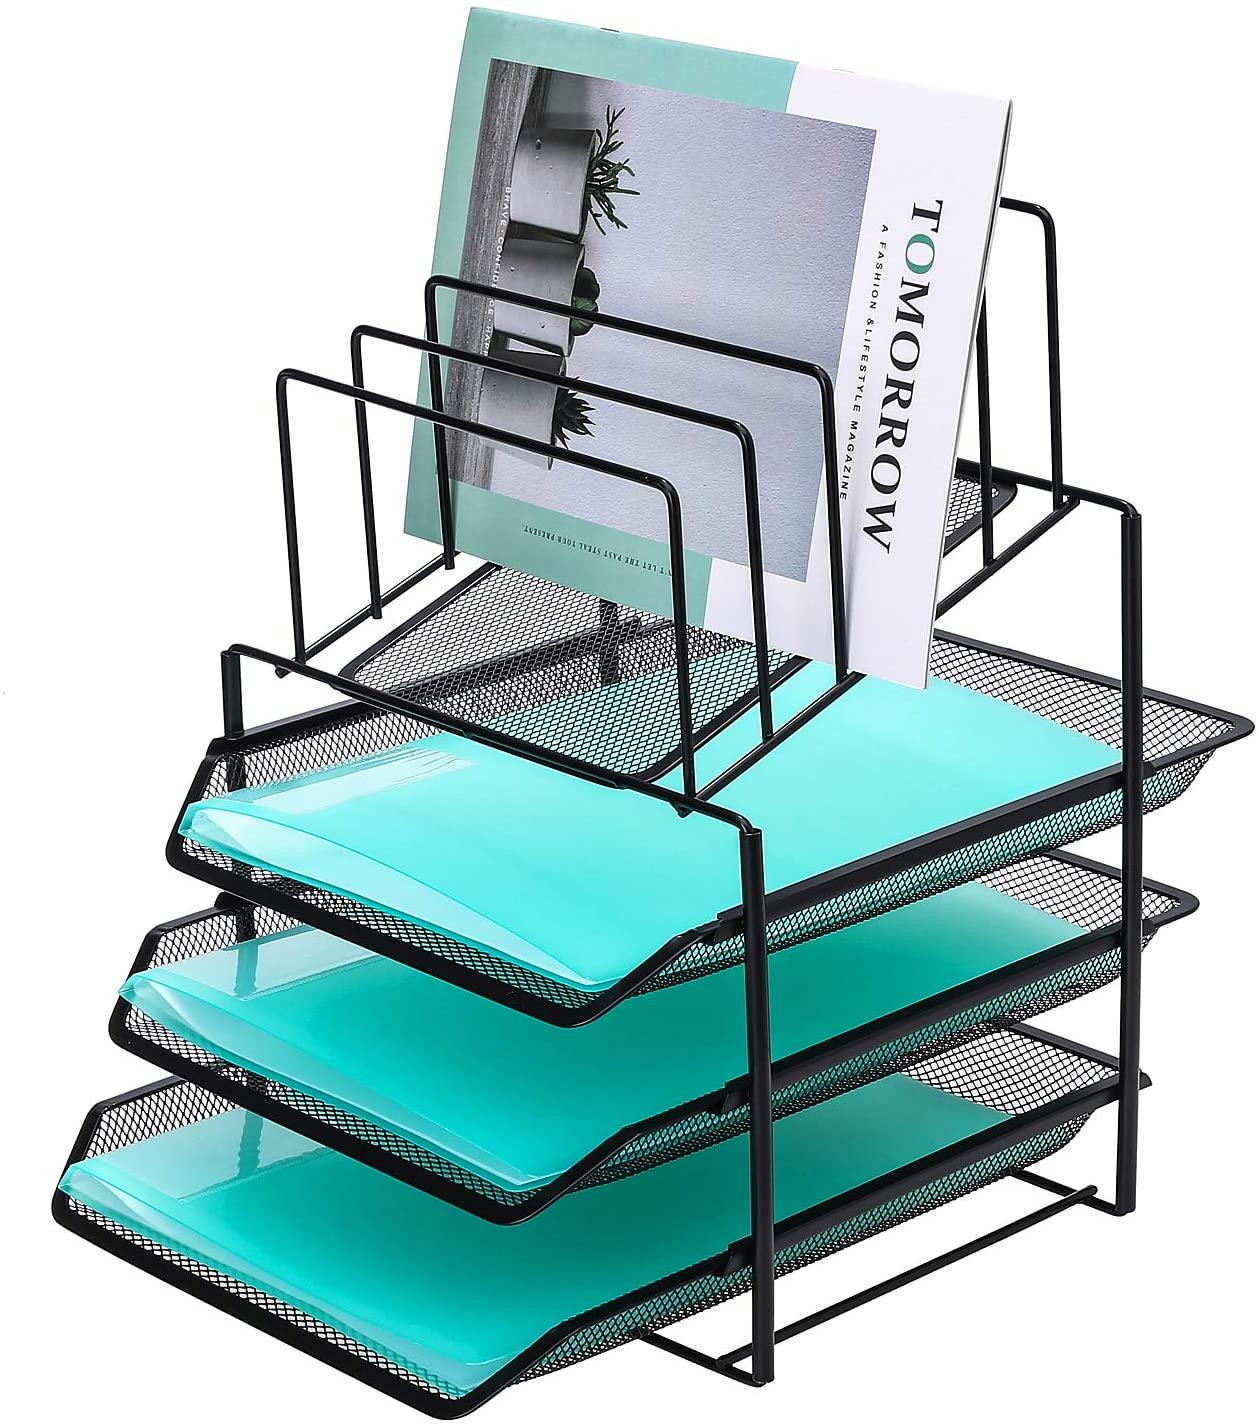 Delifox Mesh Desk Organizer Metal File Holder Mail Sorter with 5 Racks and 3 Trays